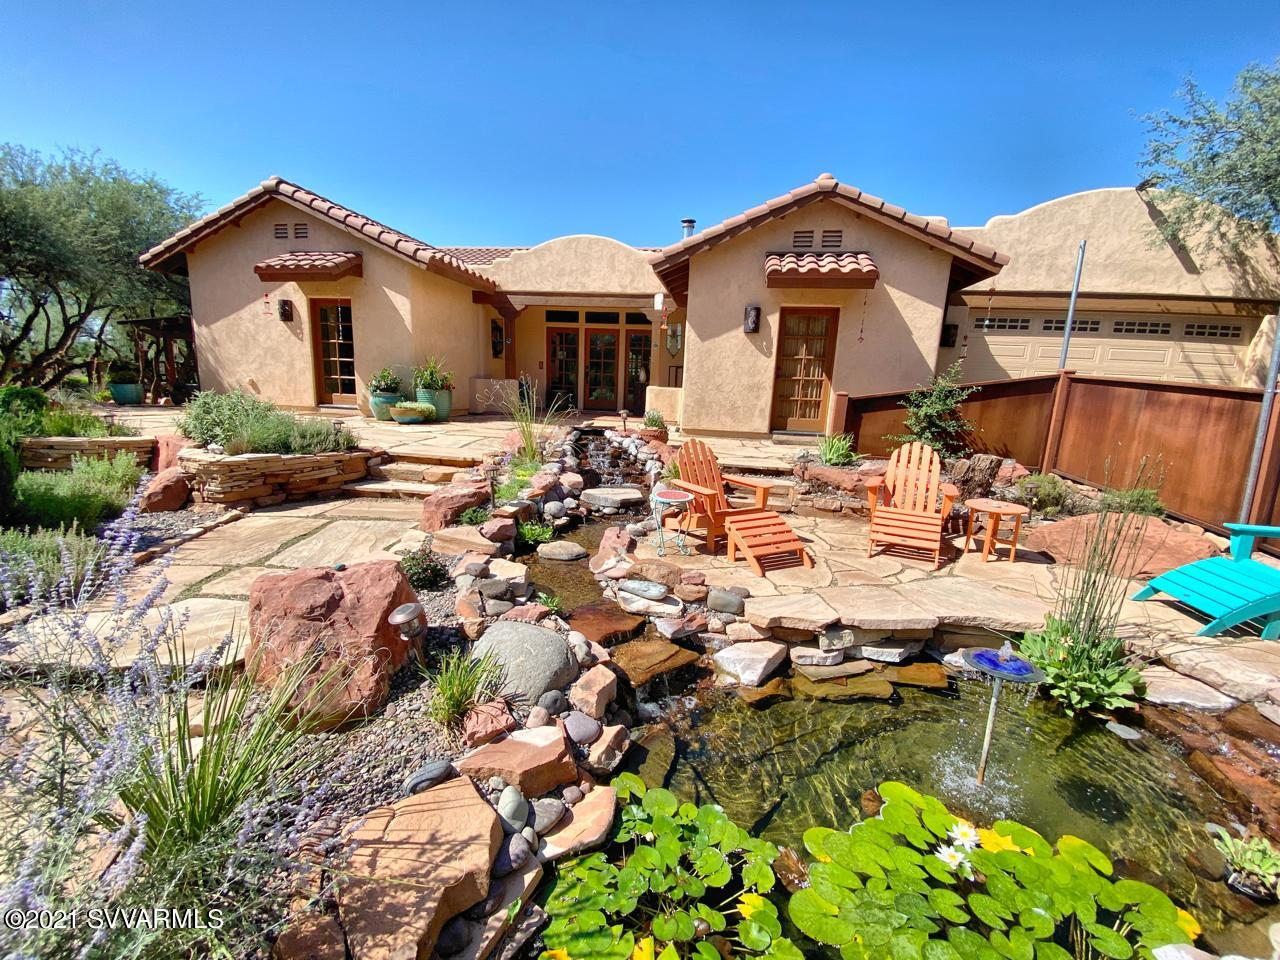 1250 Tuff Cody Tr Cornville, AZ 86325